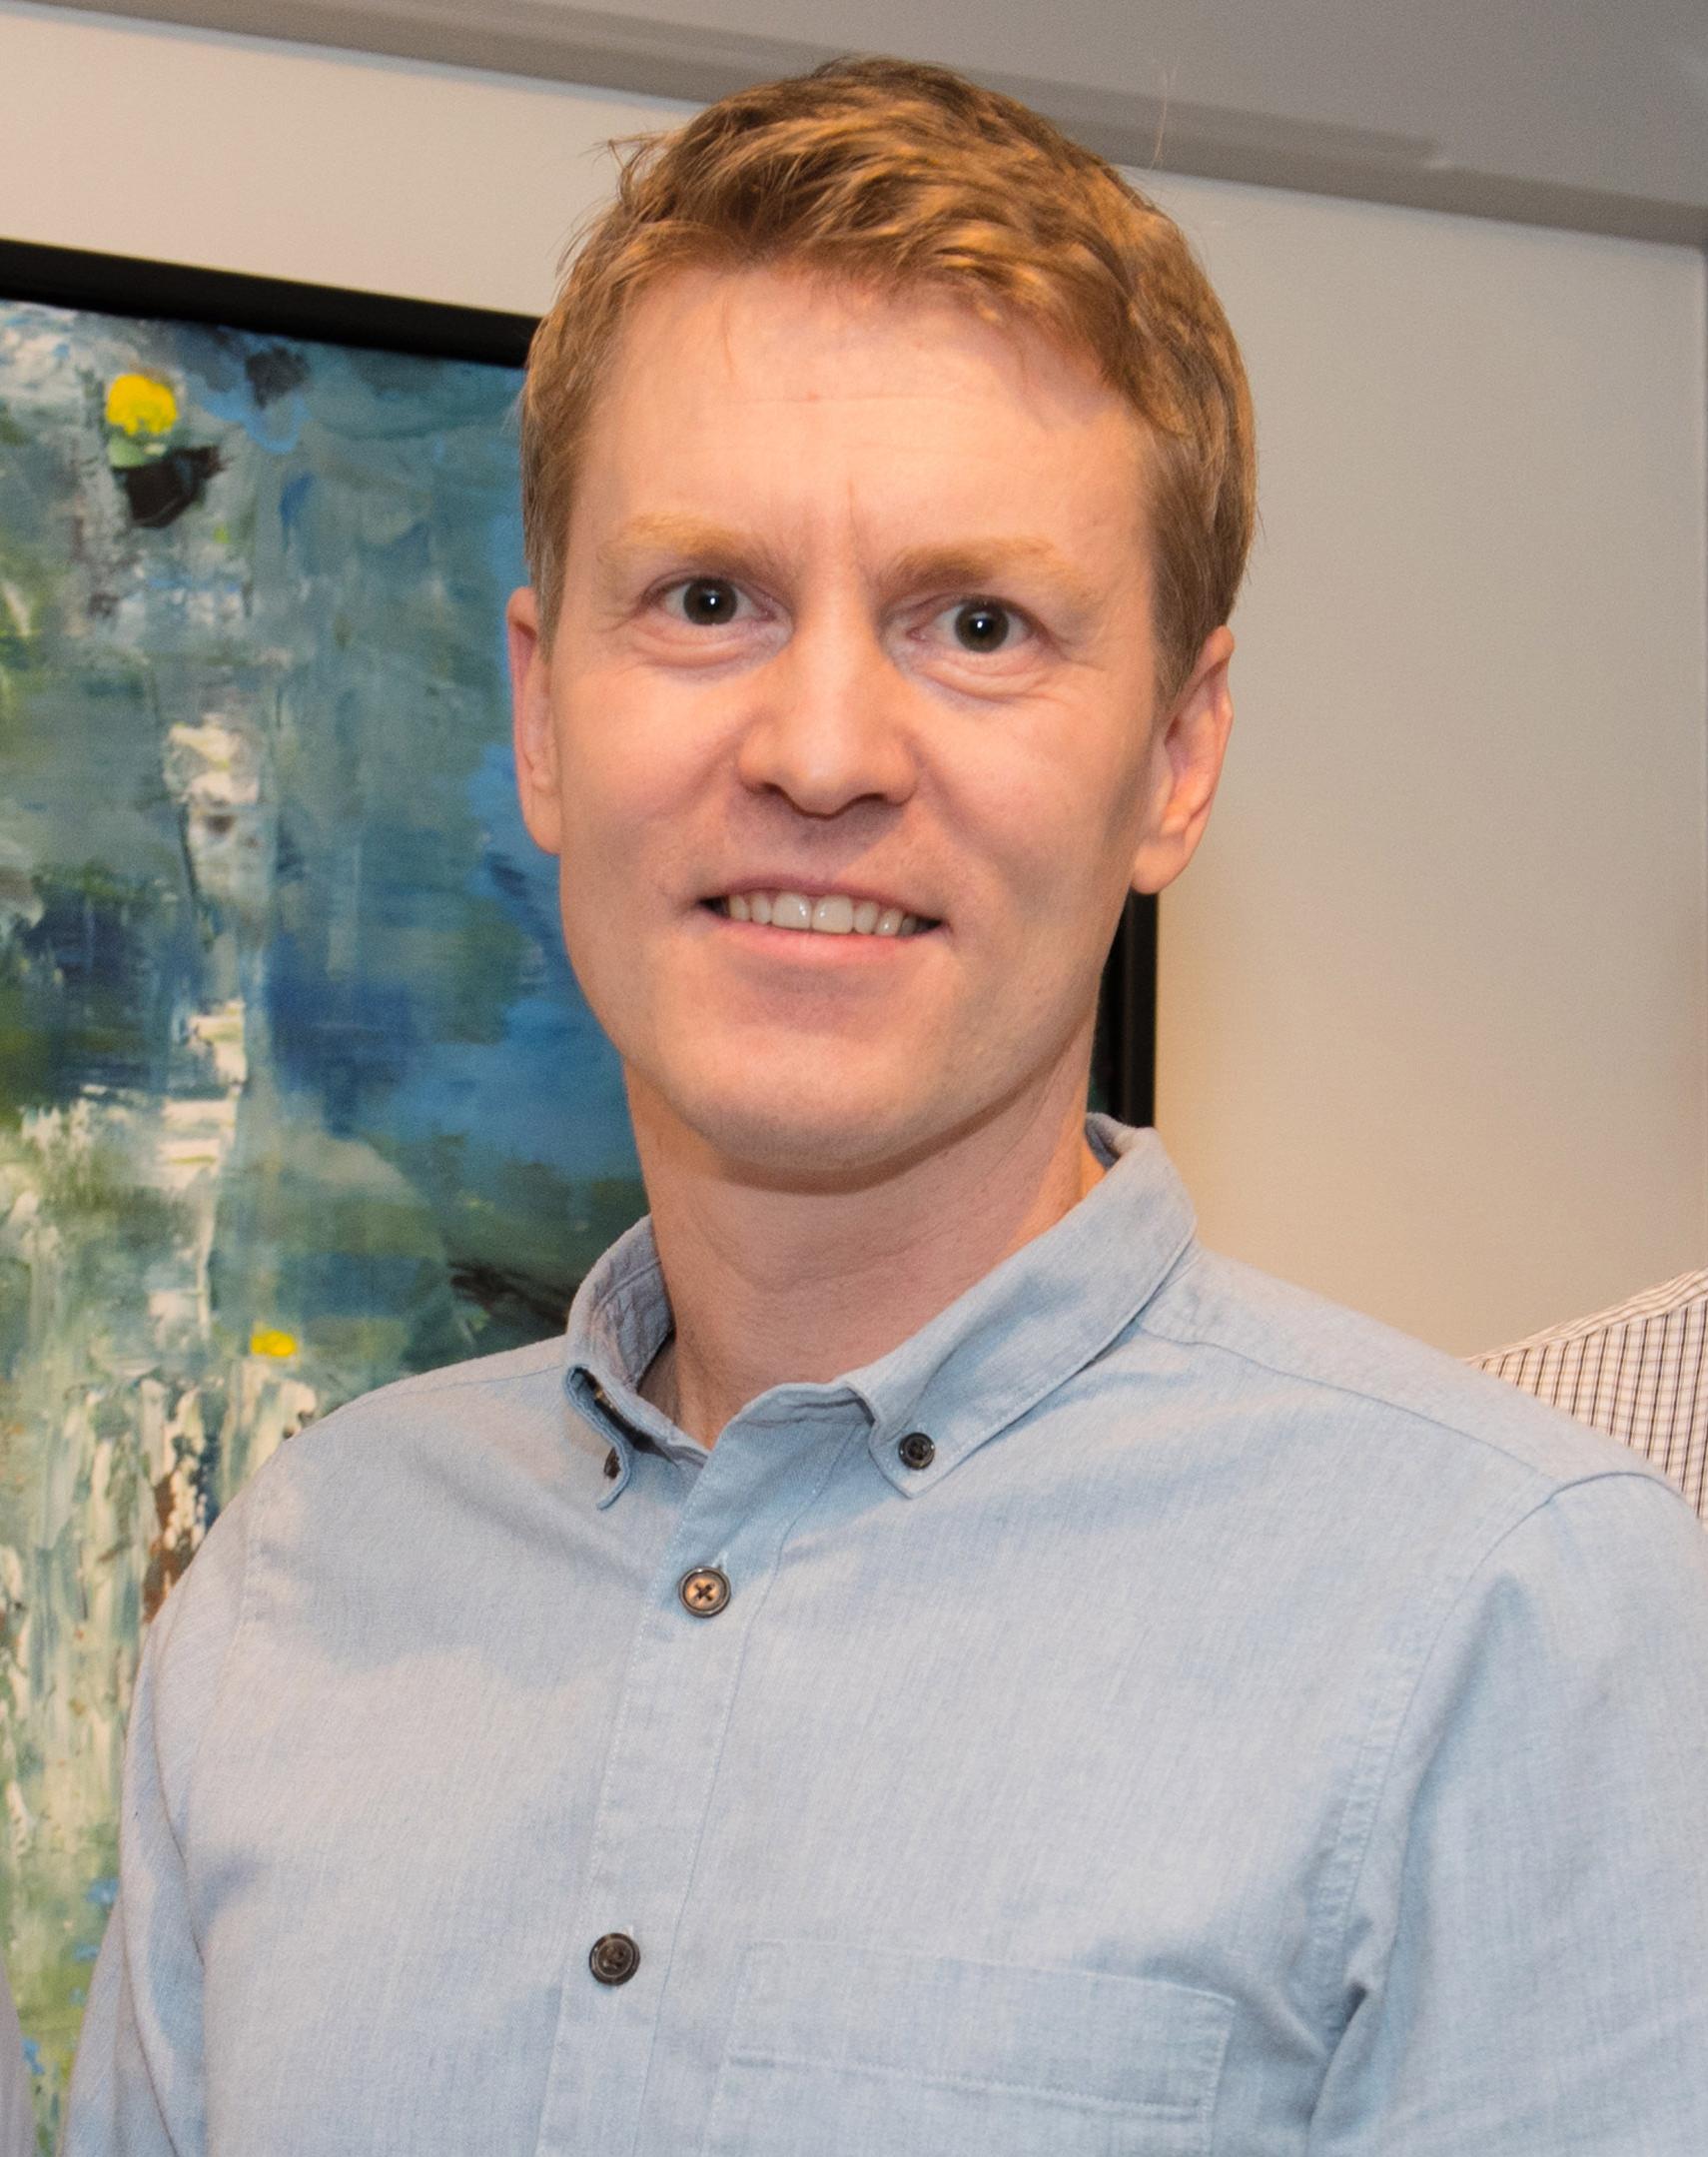 Konsernsjef Eirik Welde i Nordlaks (foto: Bjørn Eide)